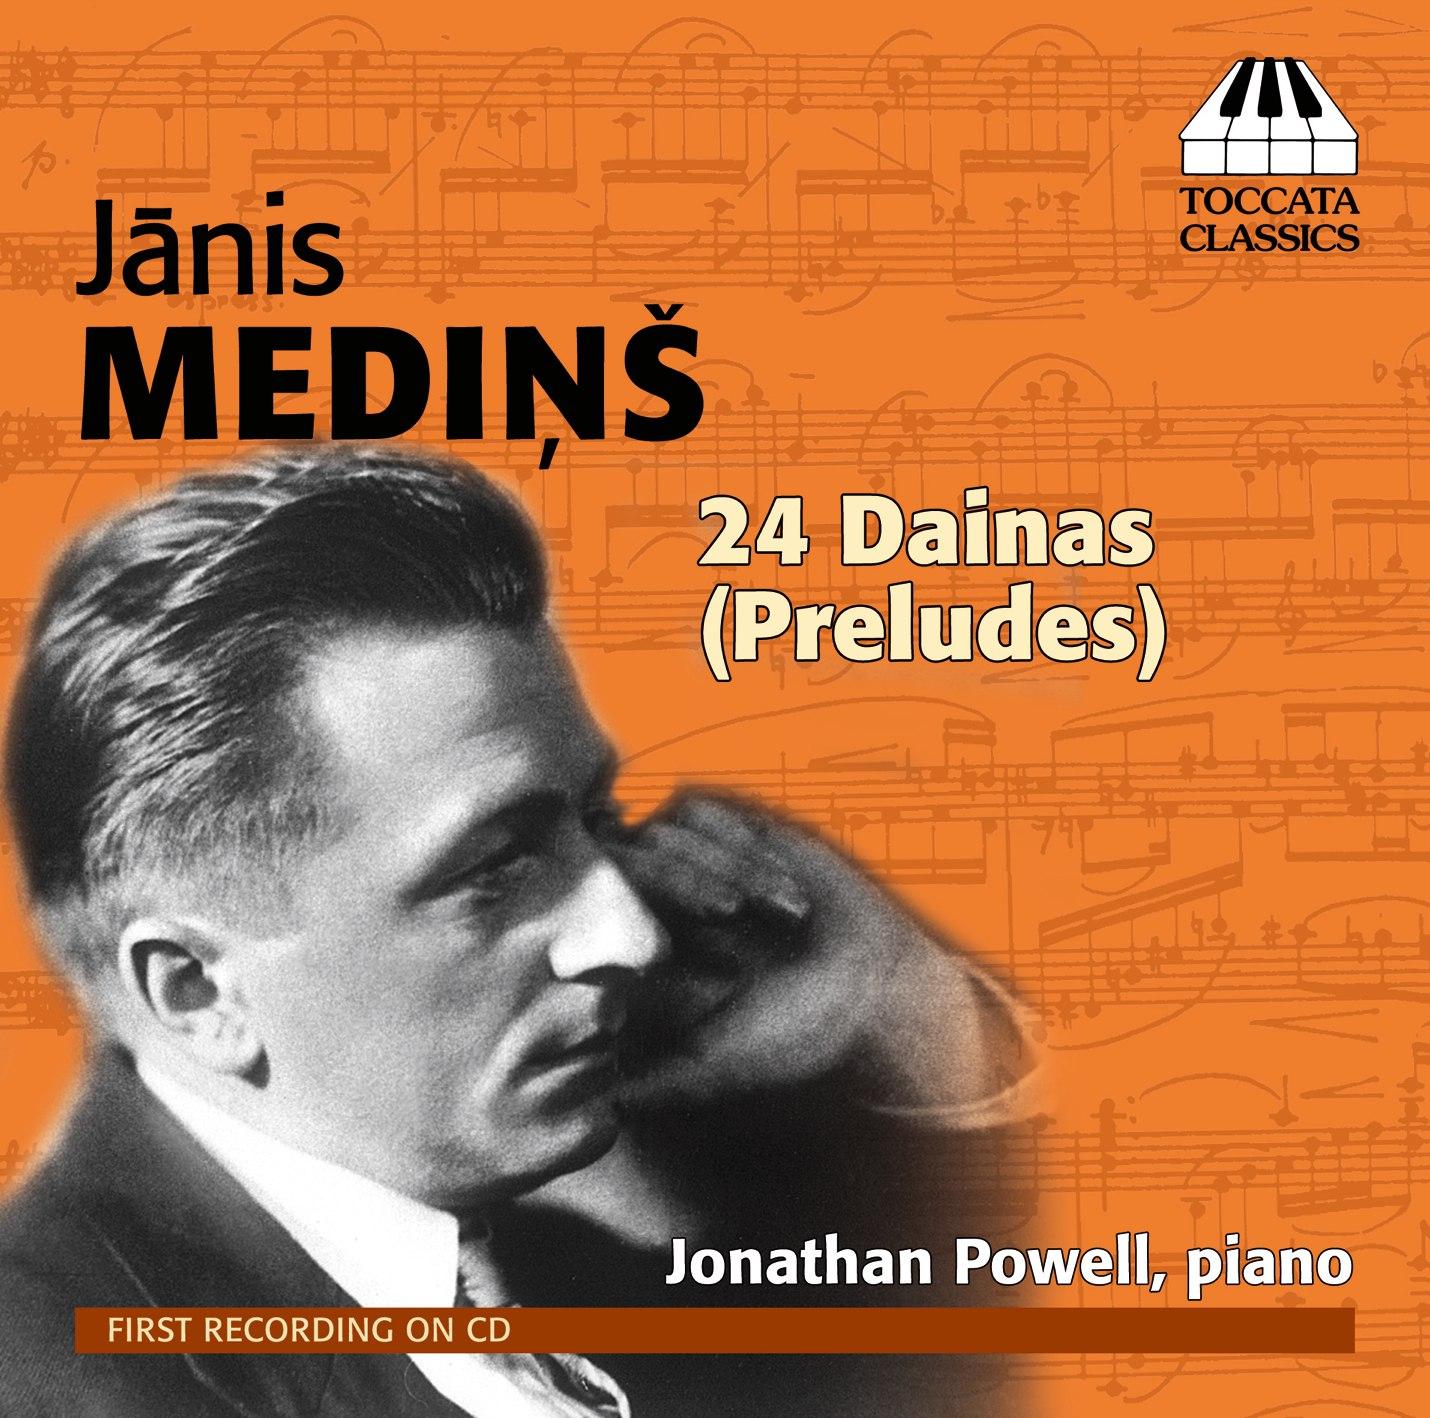 Jānis Mediņš: 24 Dainas (Preludes)